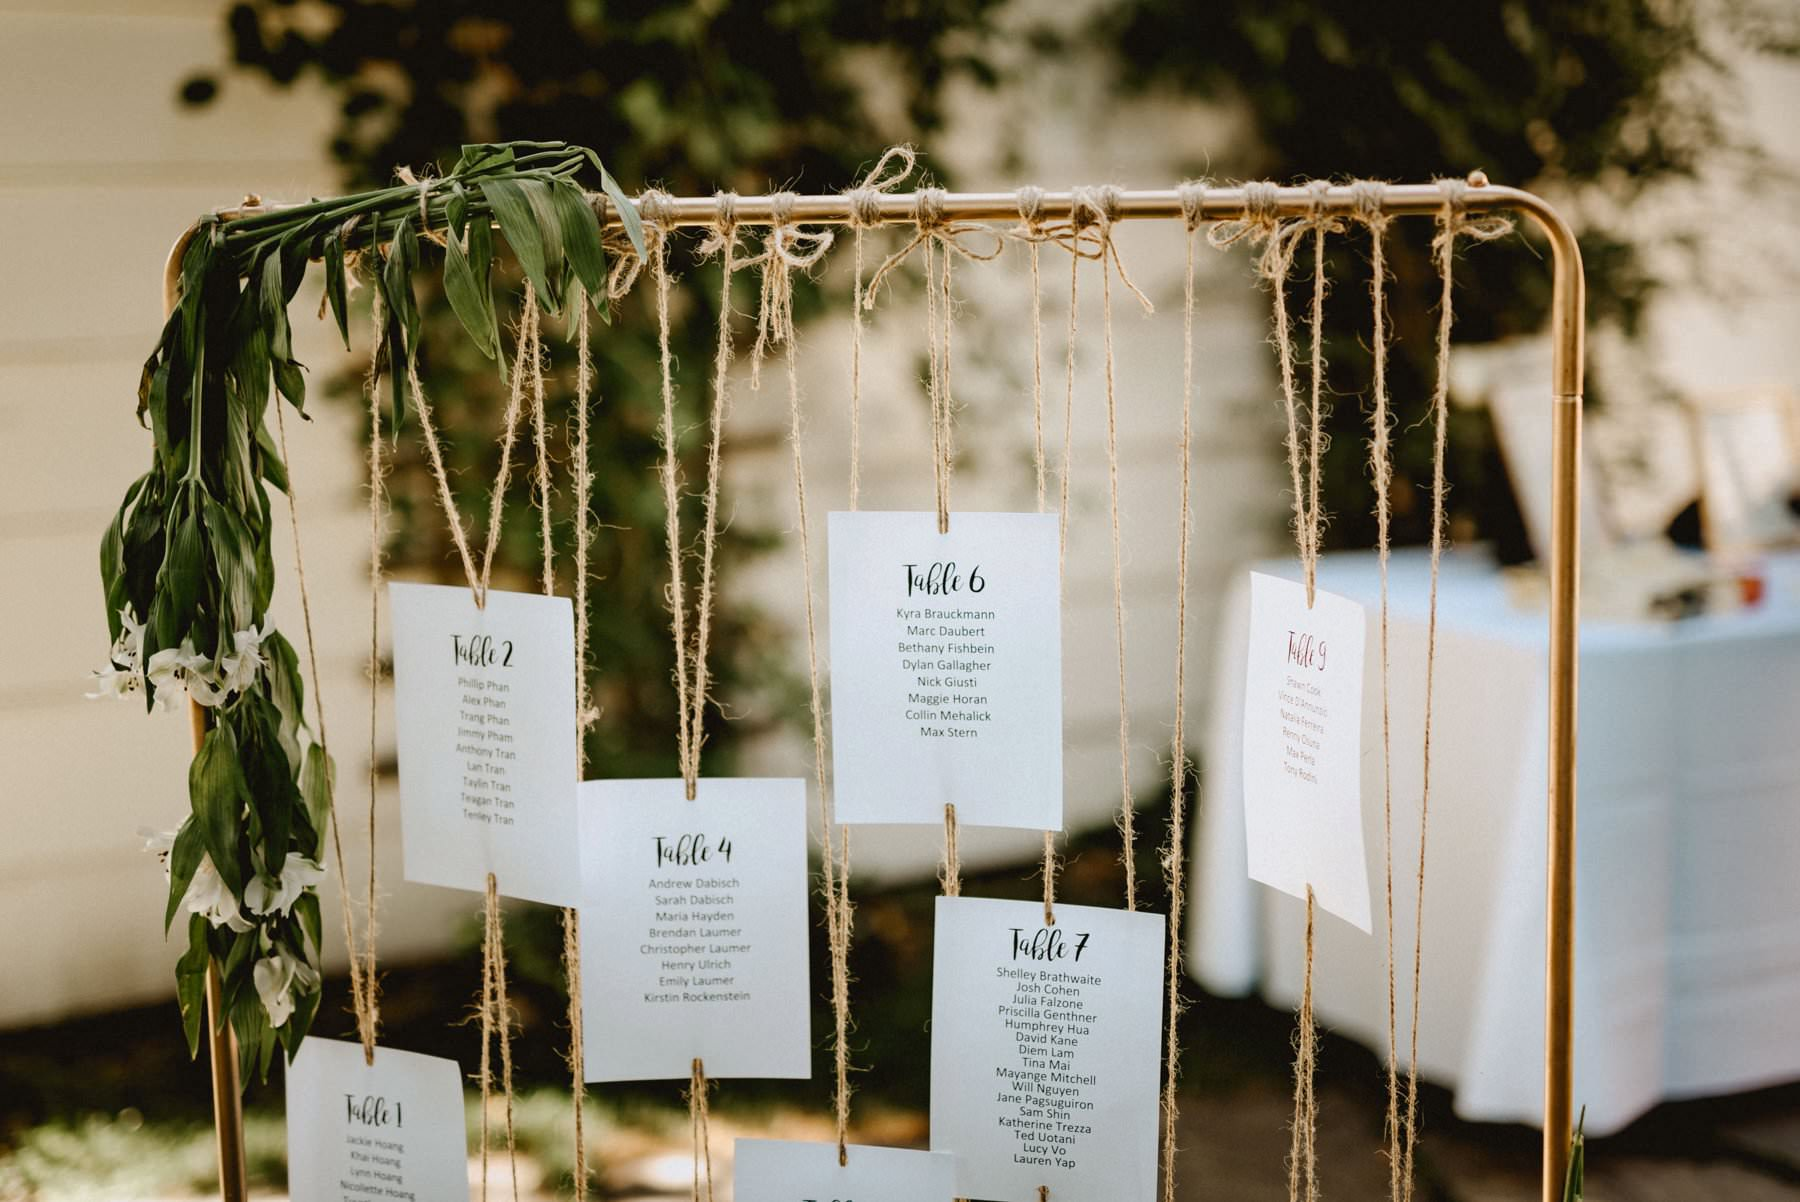 Appleford-estate-wedding-103.jpg